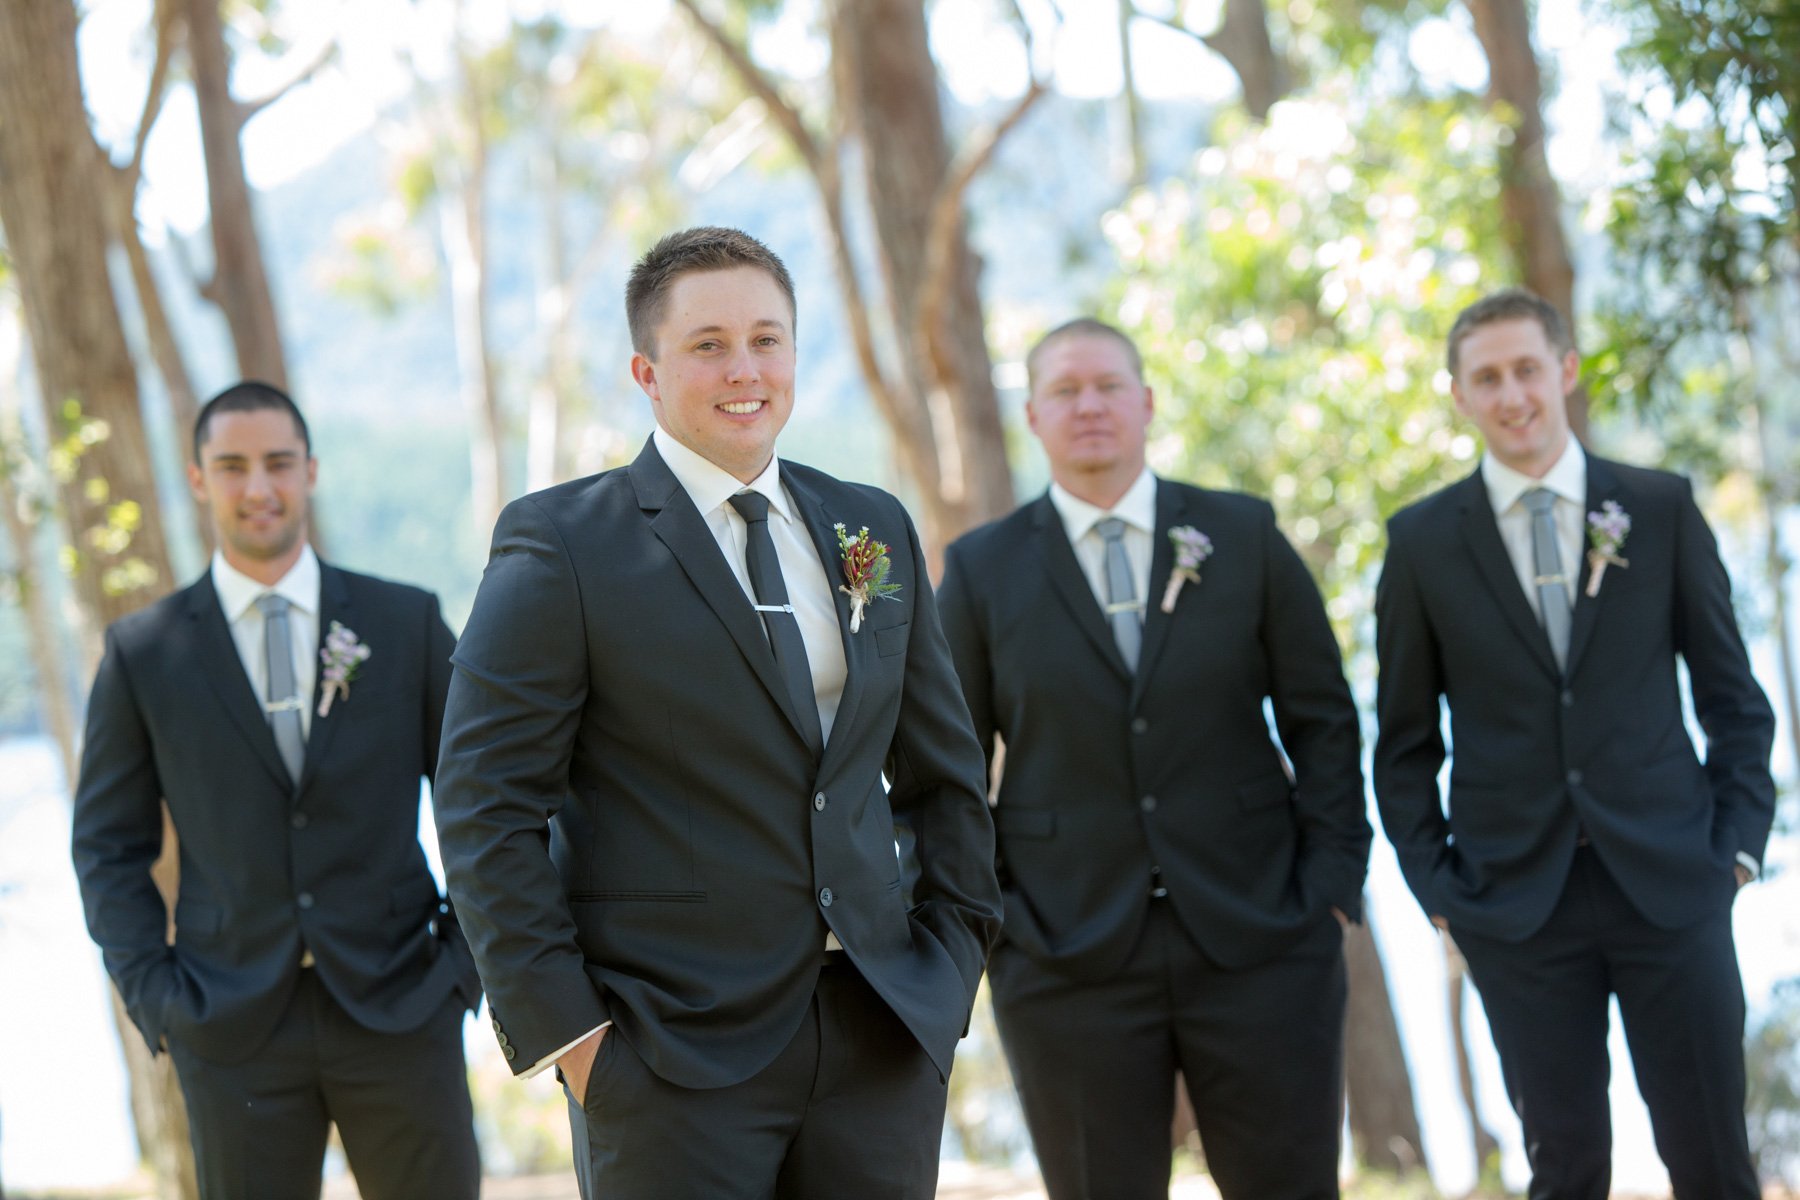 Jenna_Ray_Rustic-Wedding_003